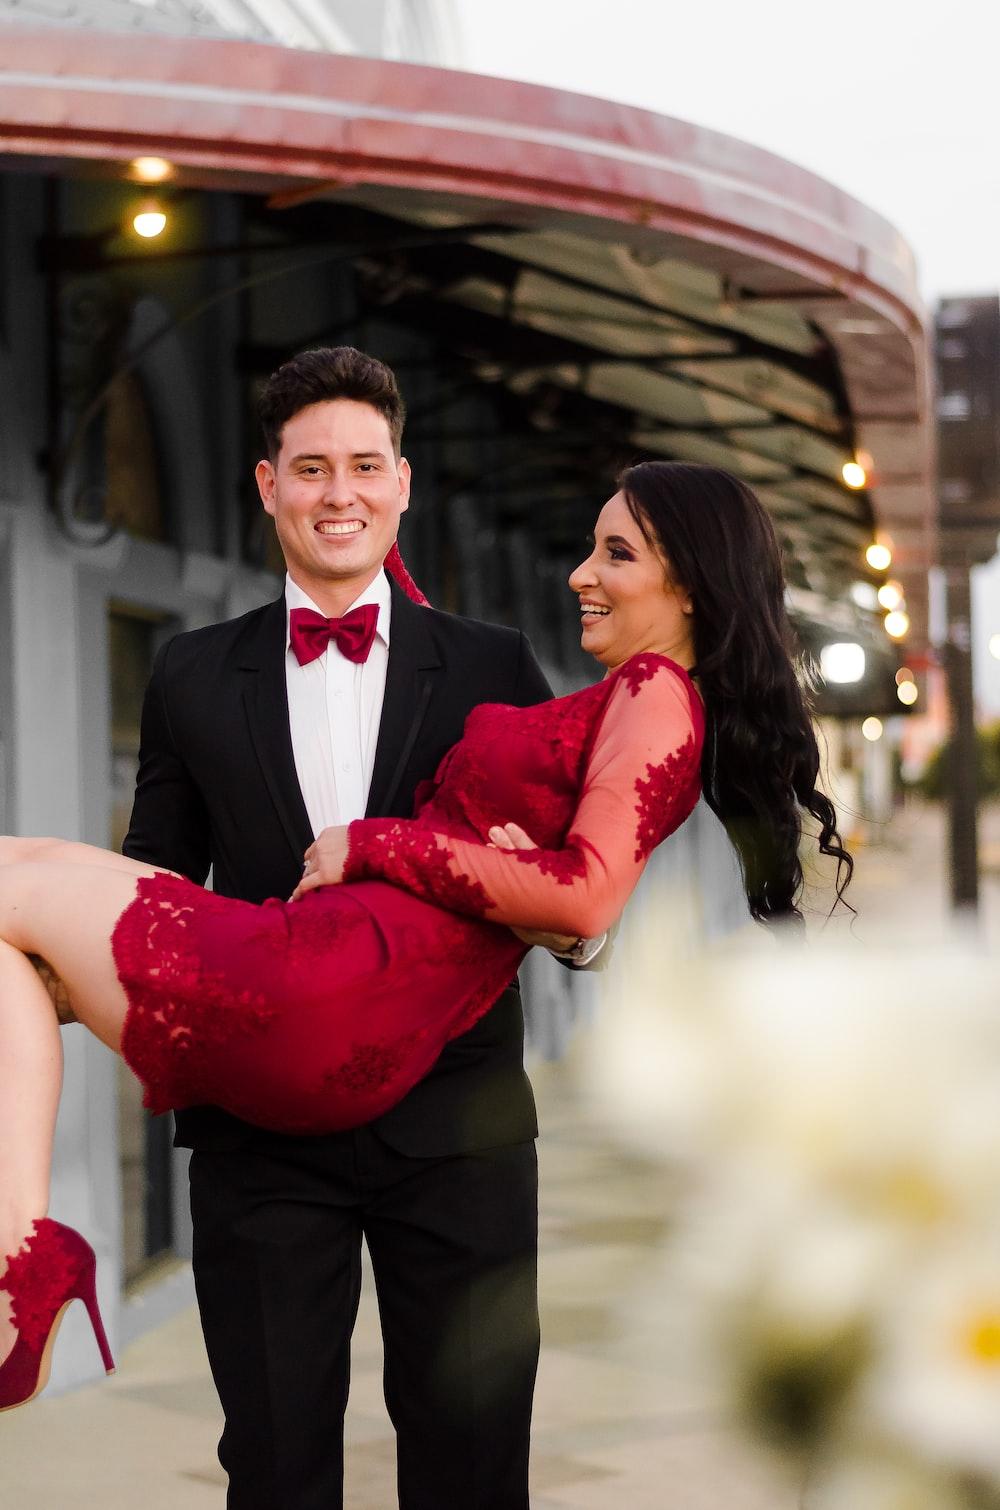 man in black suit hugging woman in red dress